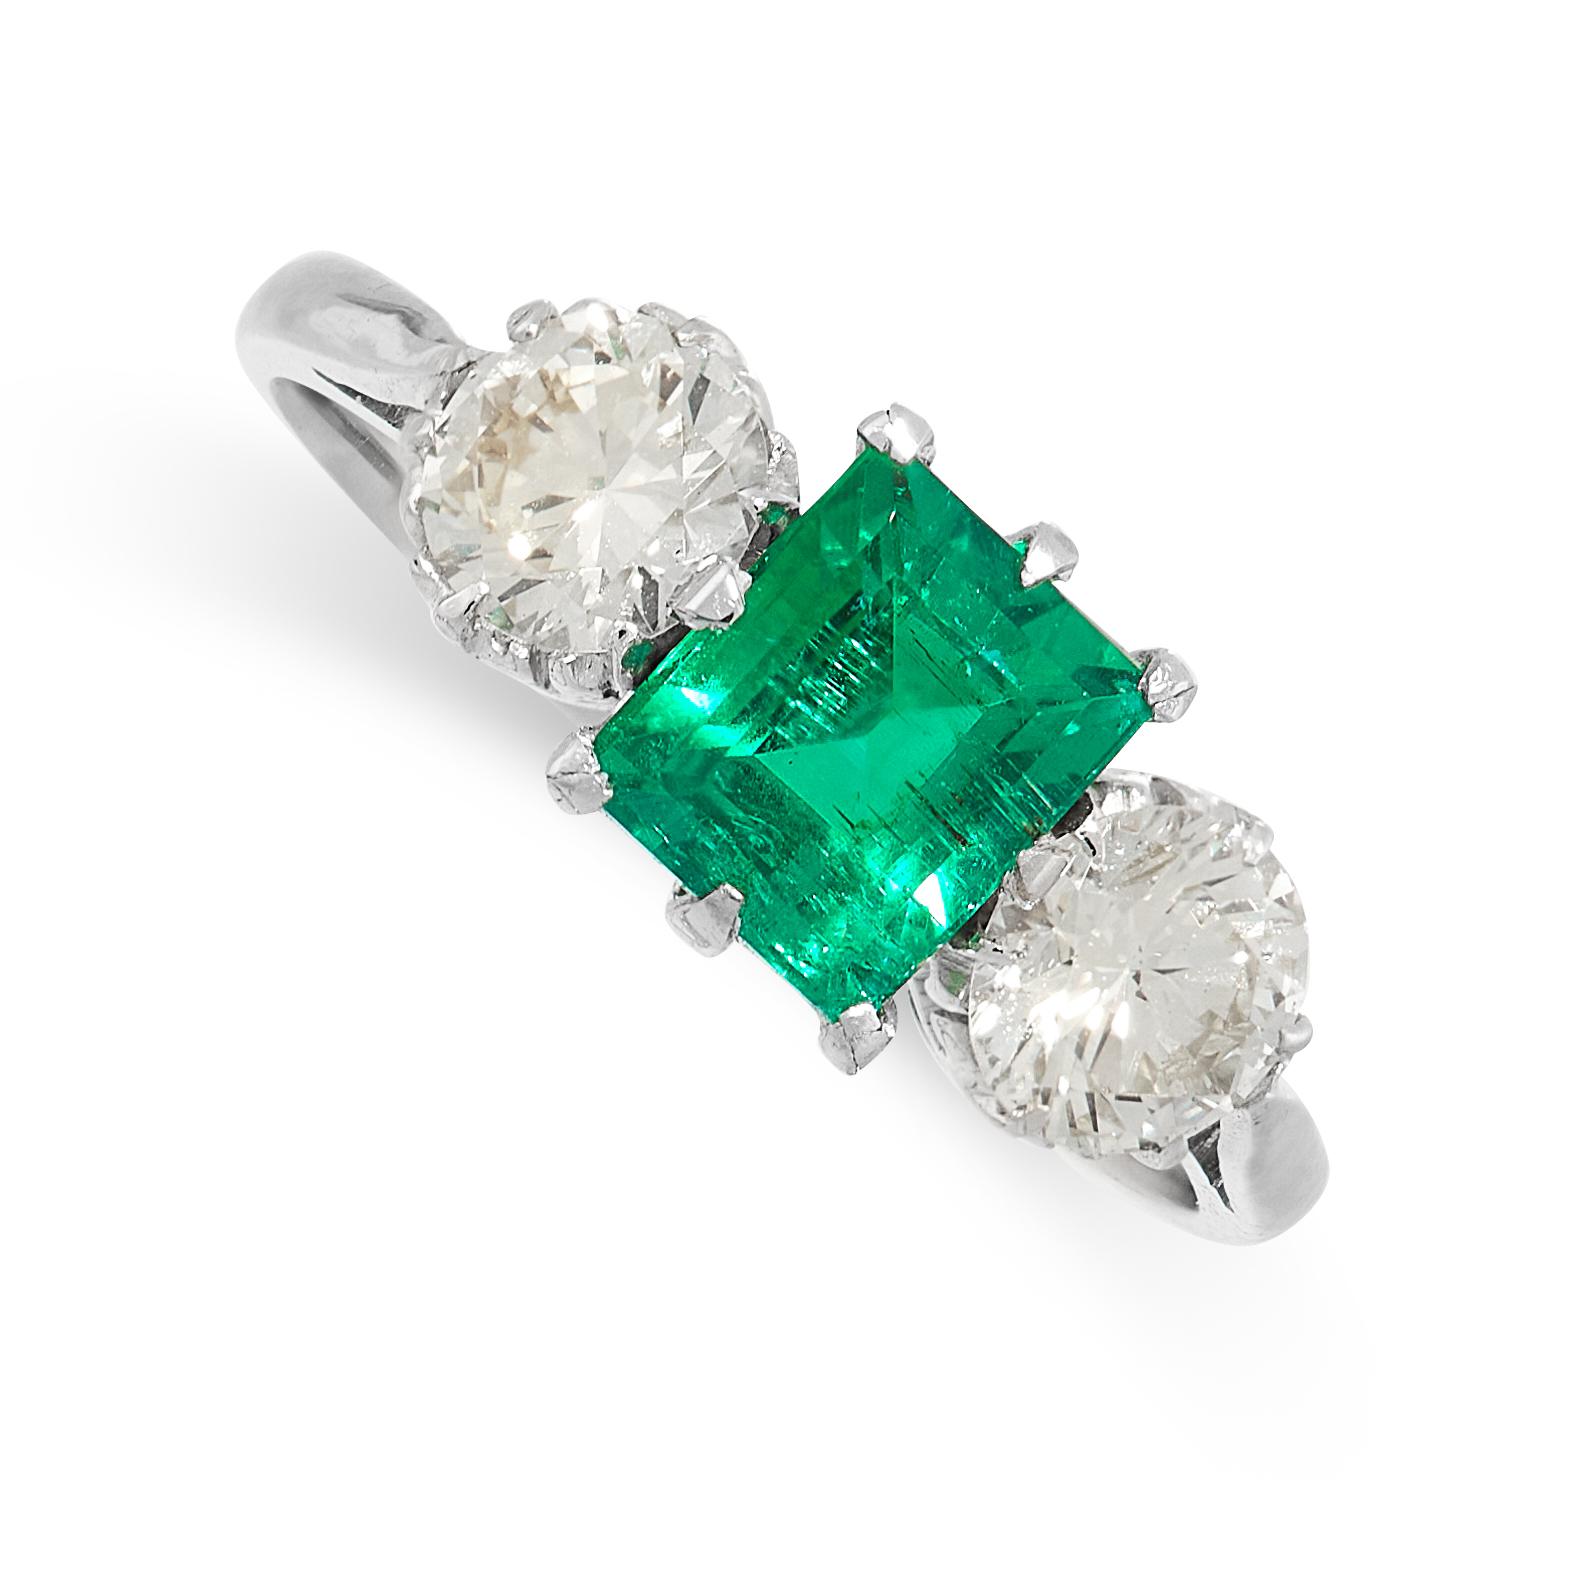 AN EMERALD AND DIAMOND DRESS RING set with a rectangular step cut emerald of 1.19 carats, between